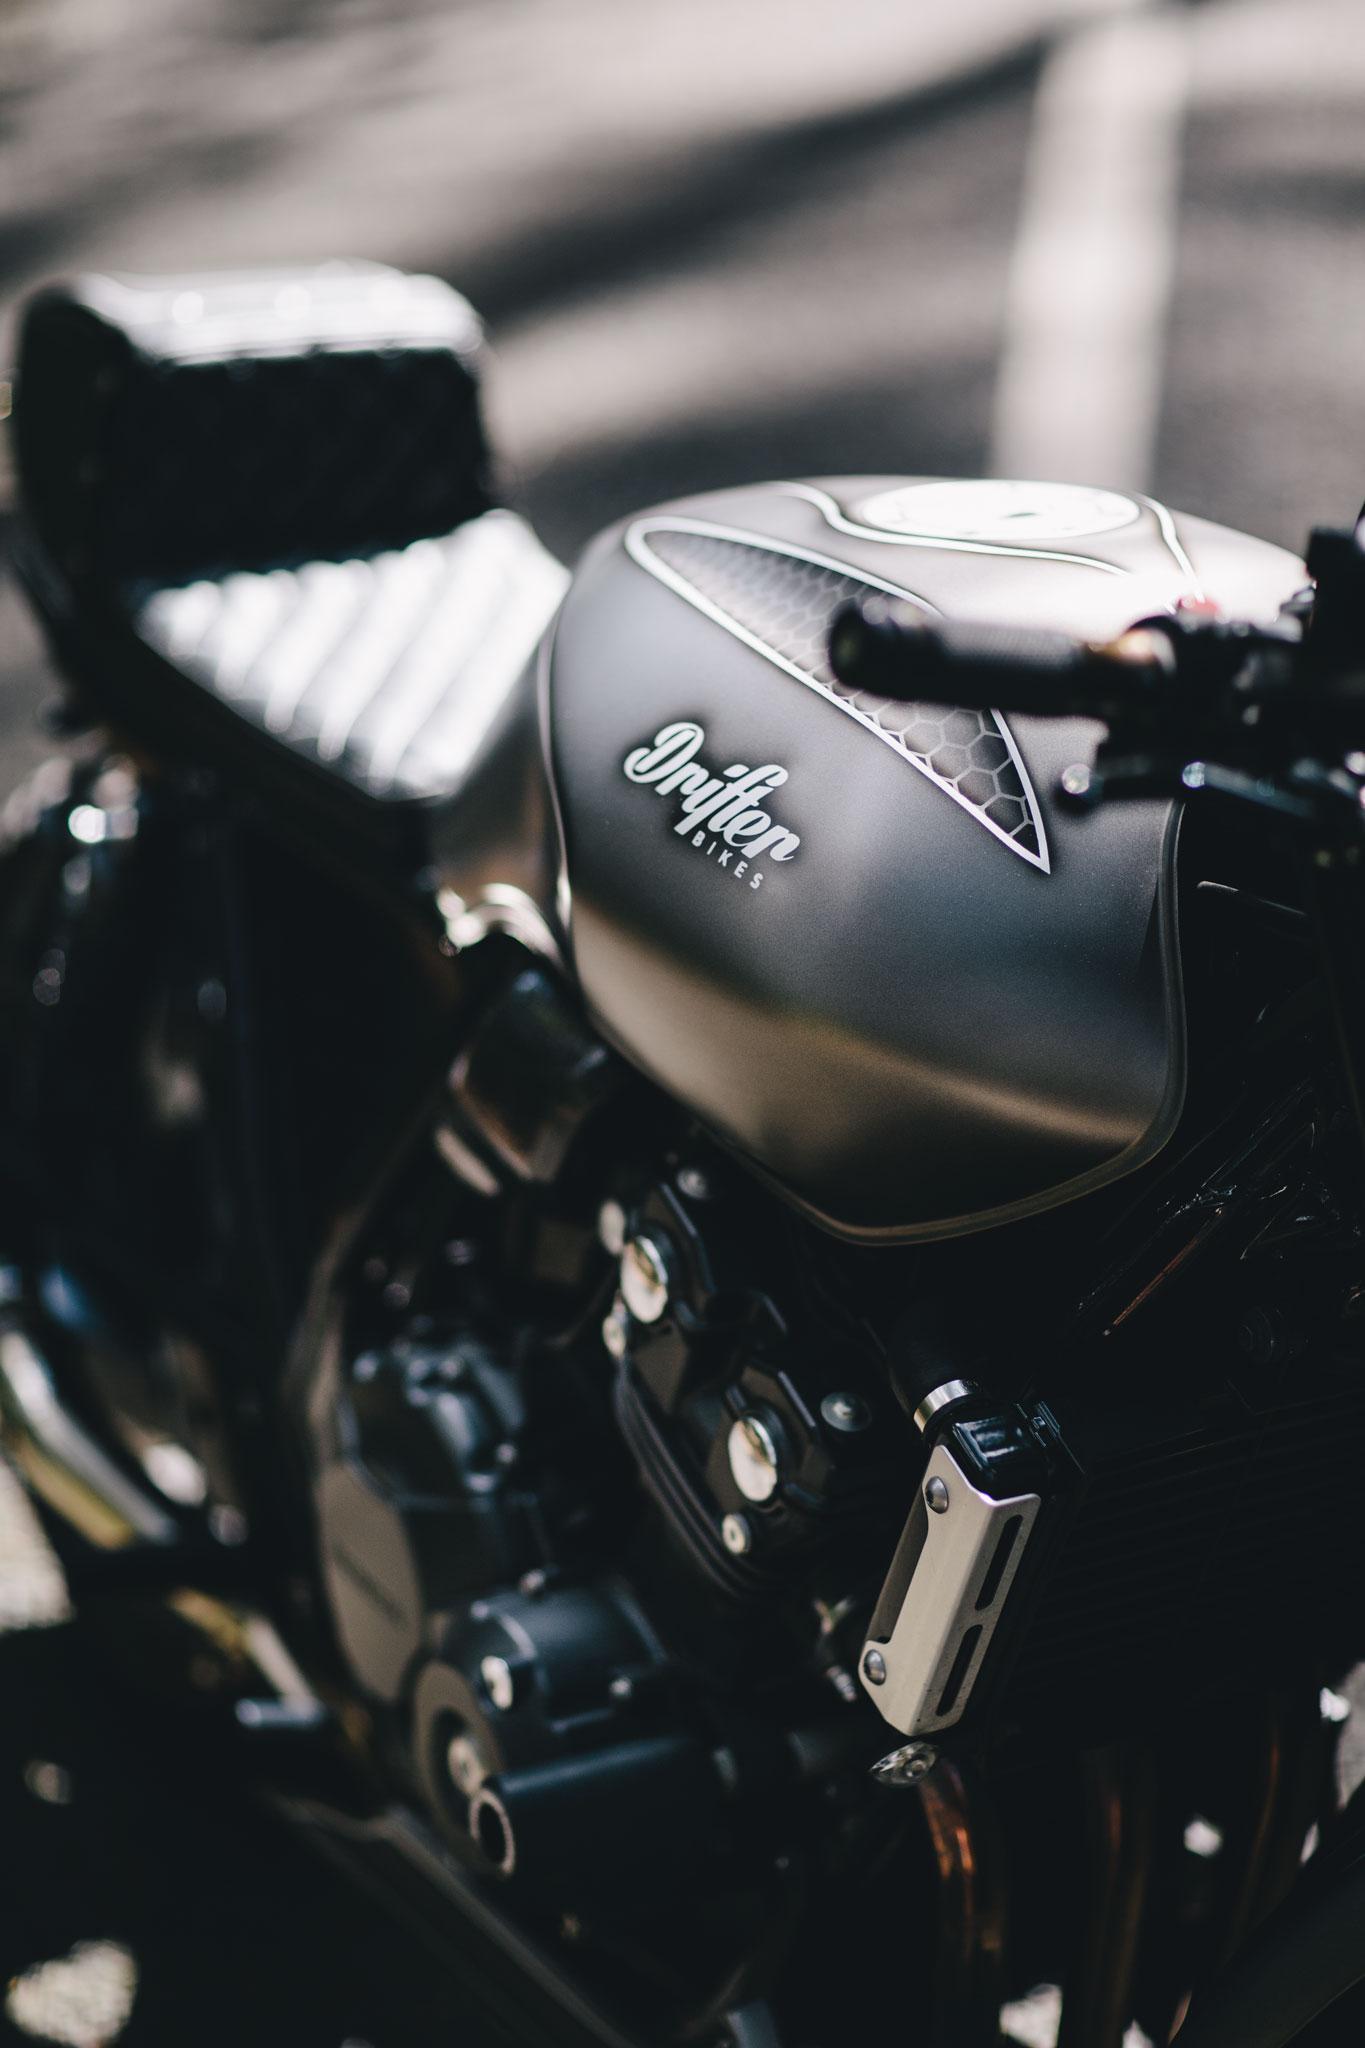 honda_cb400sf_drifterbikes_cafe_racer-258